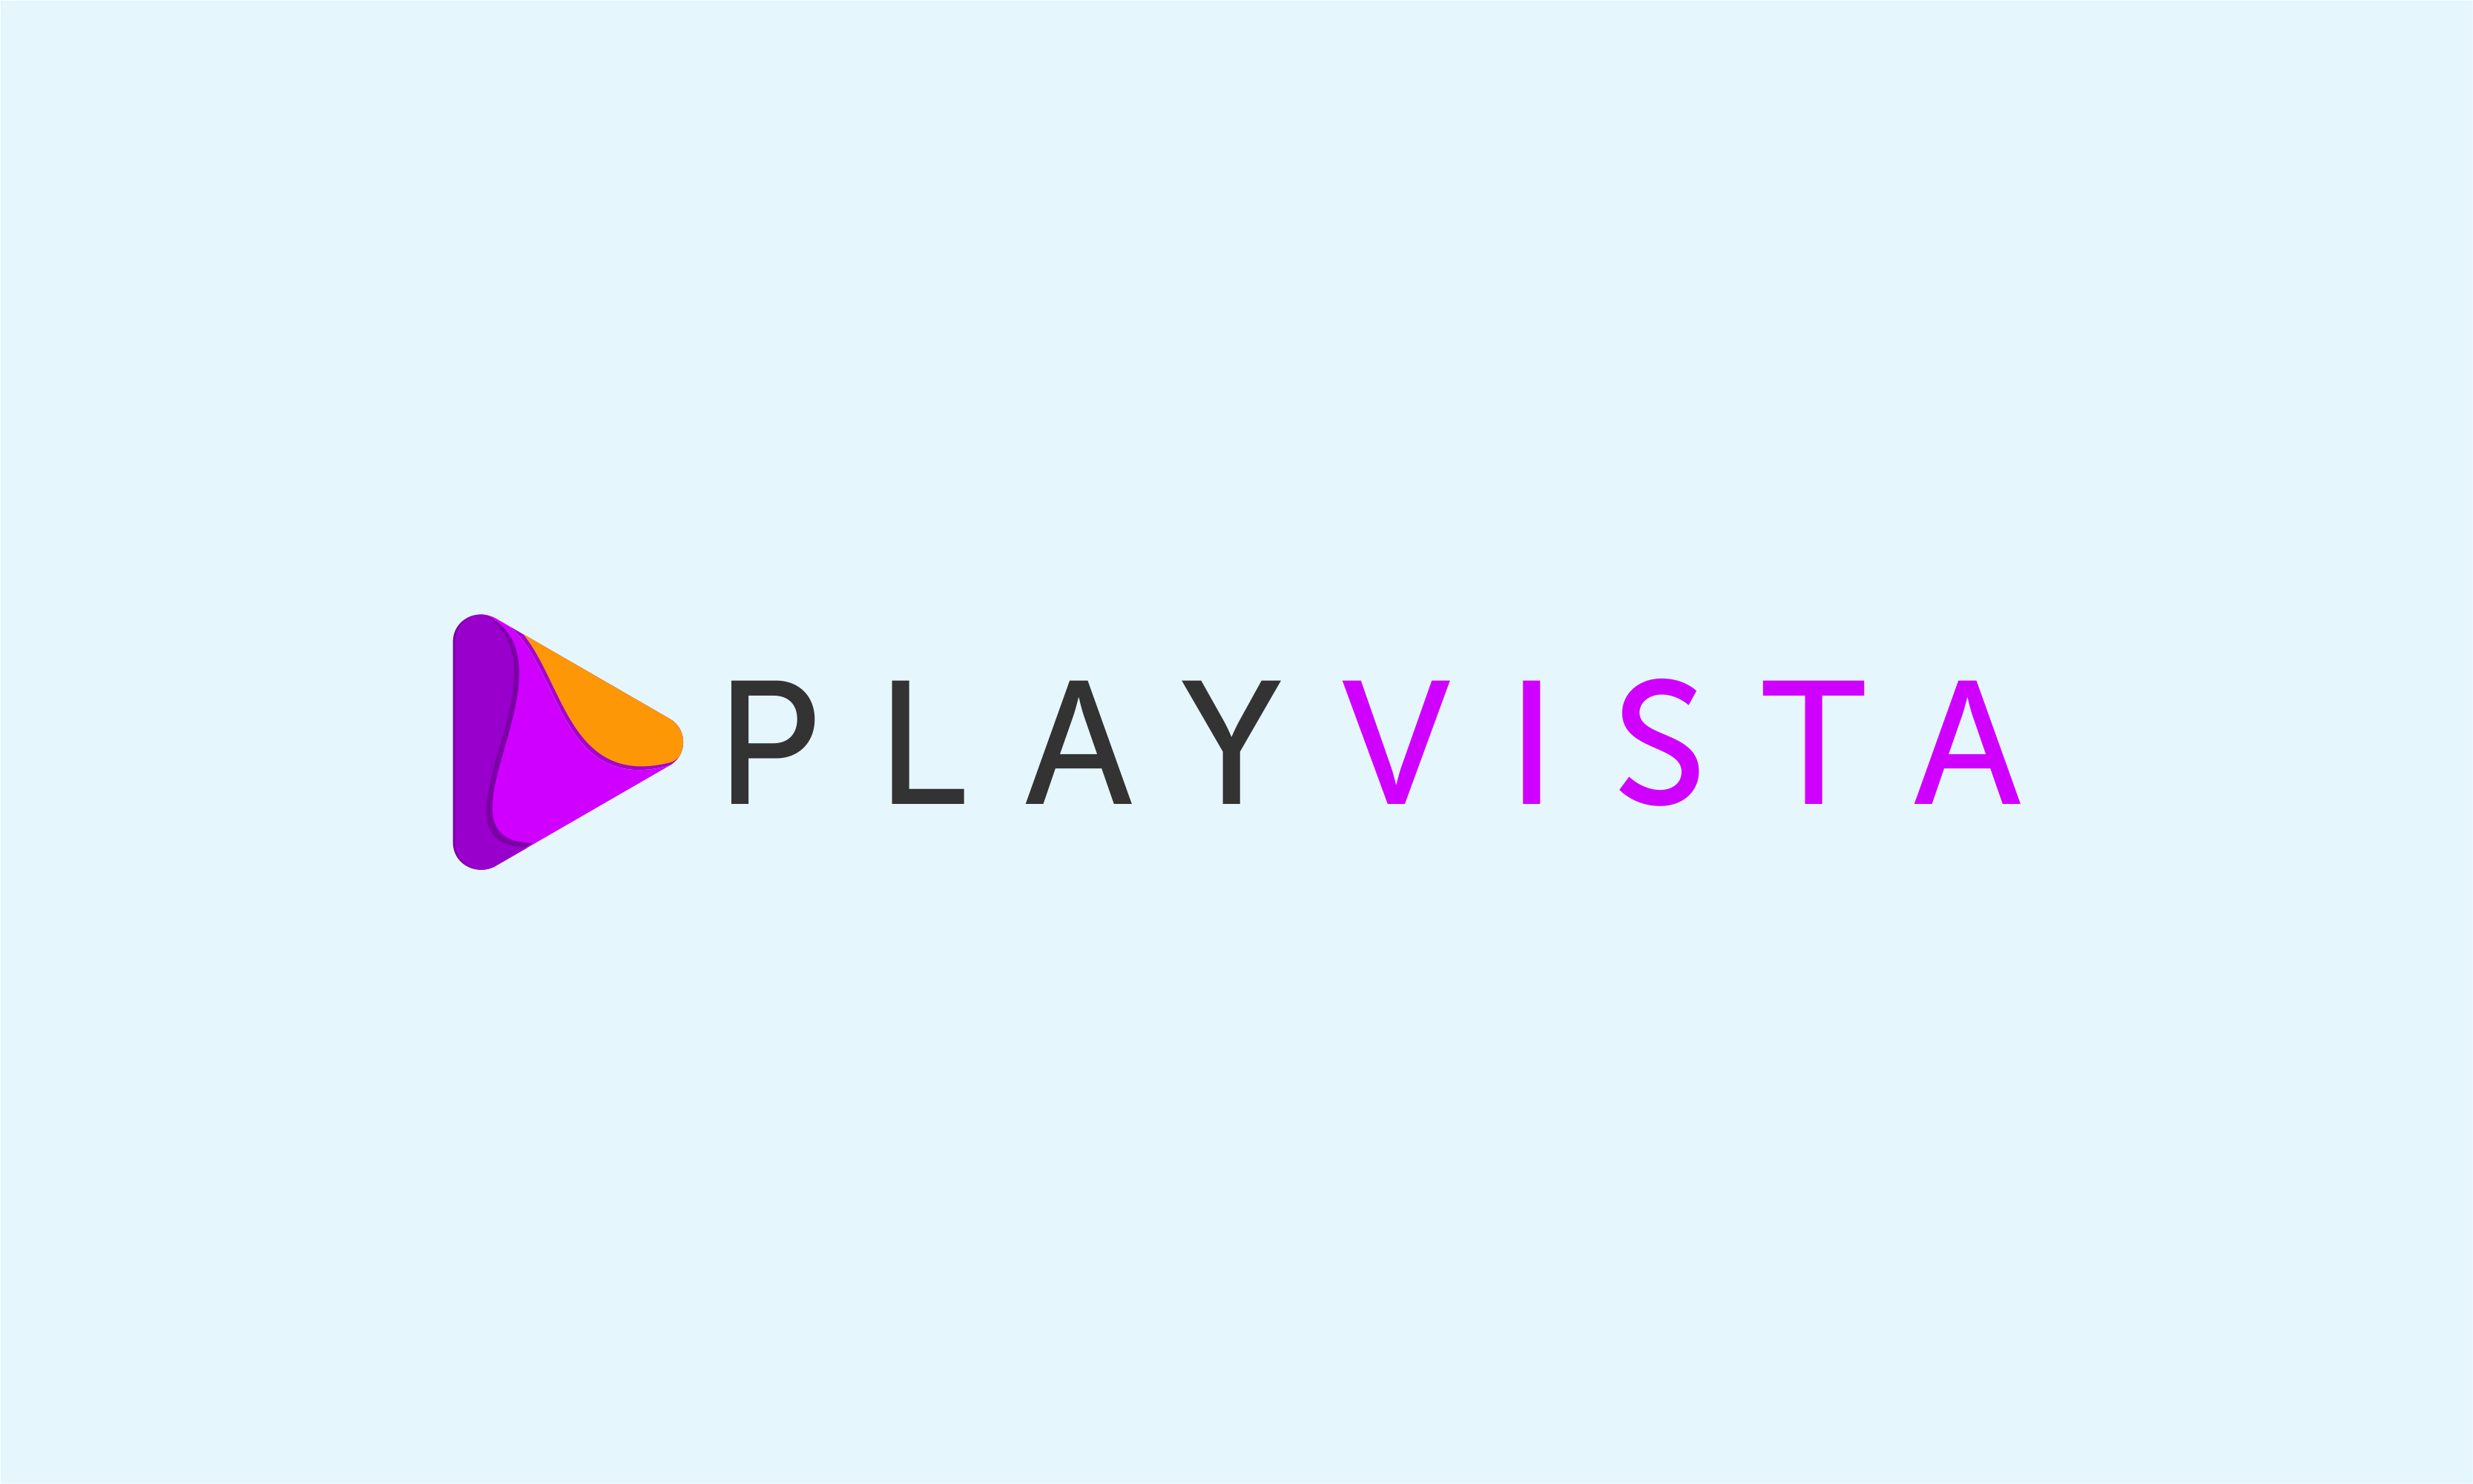 Playvista